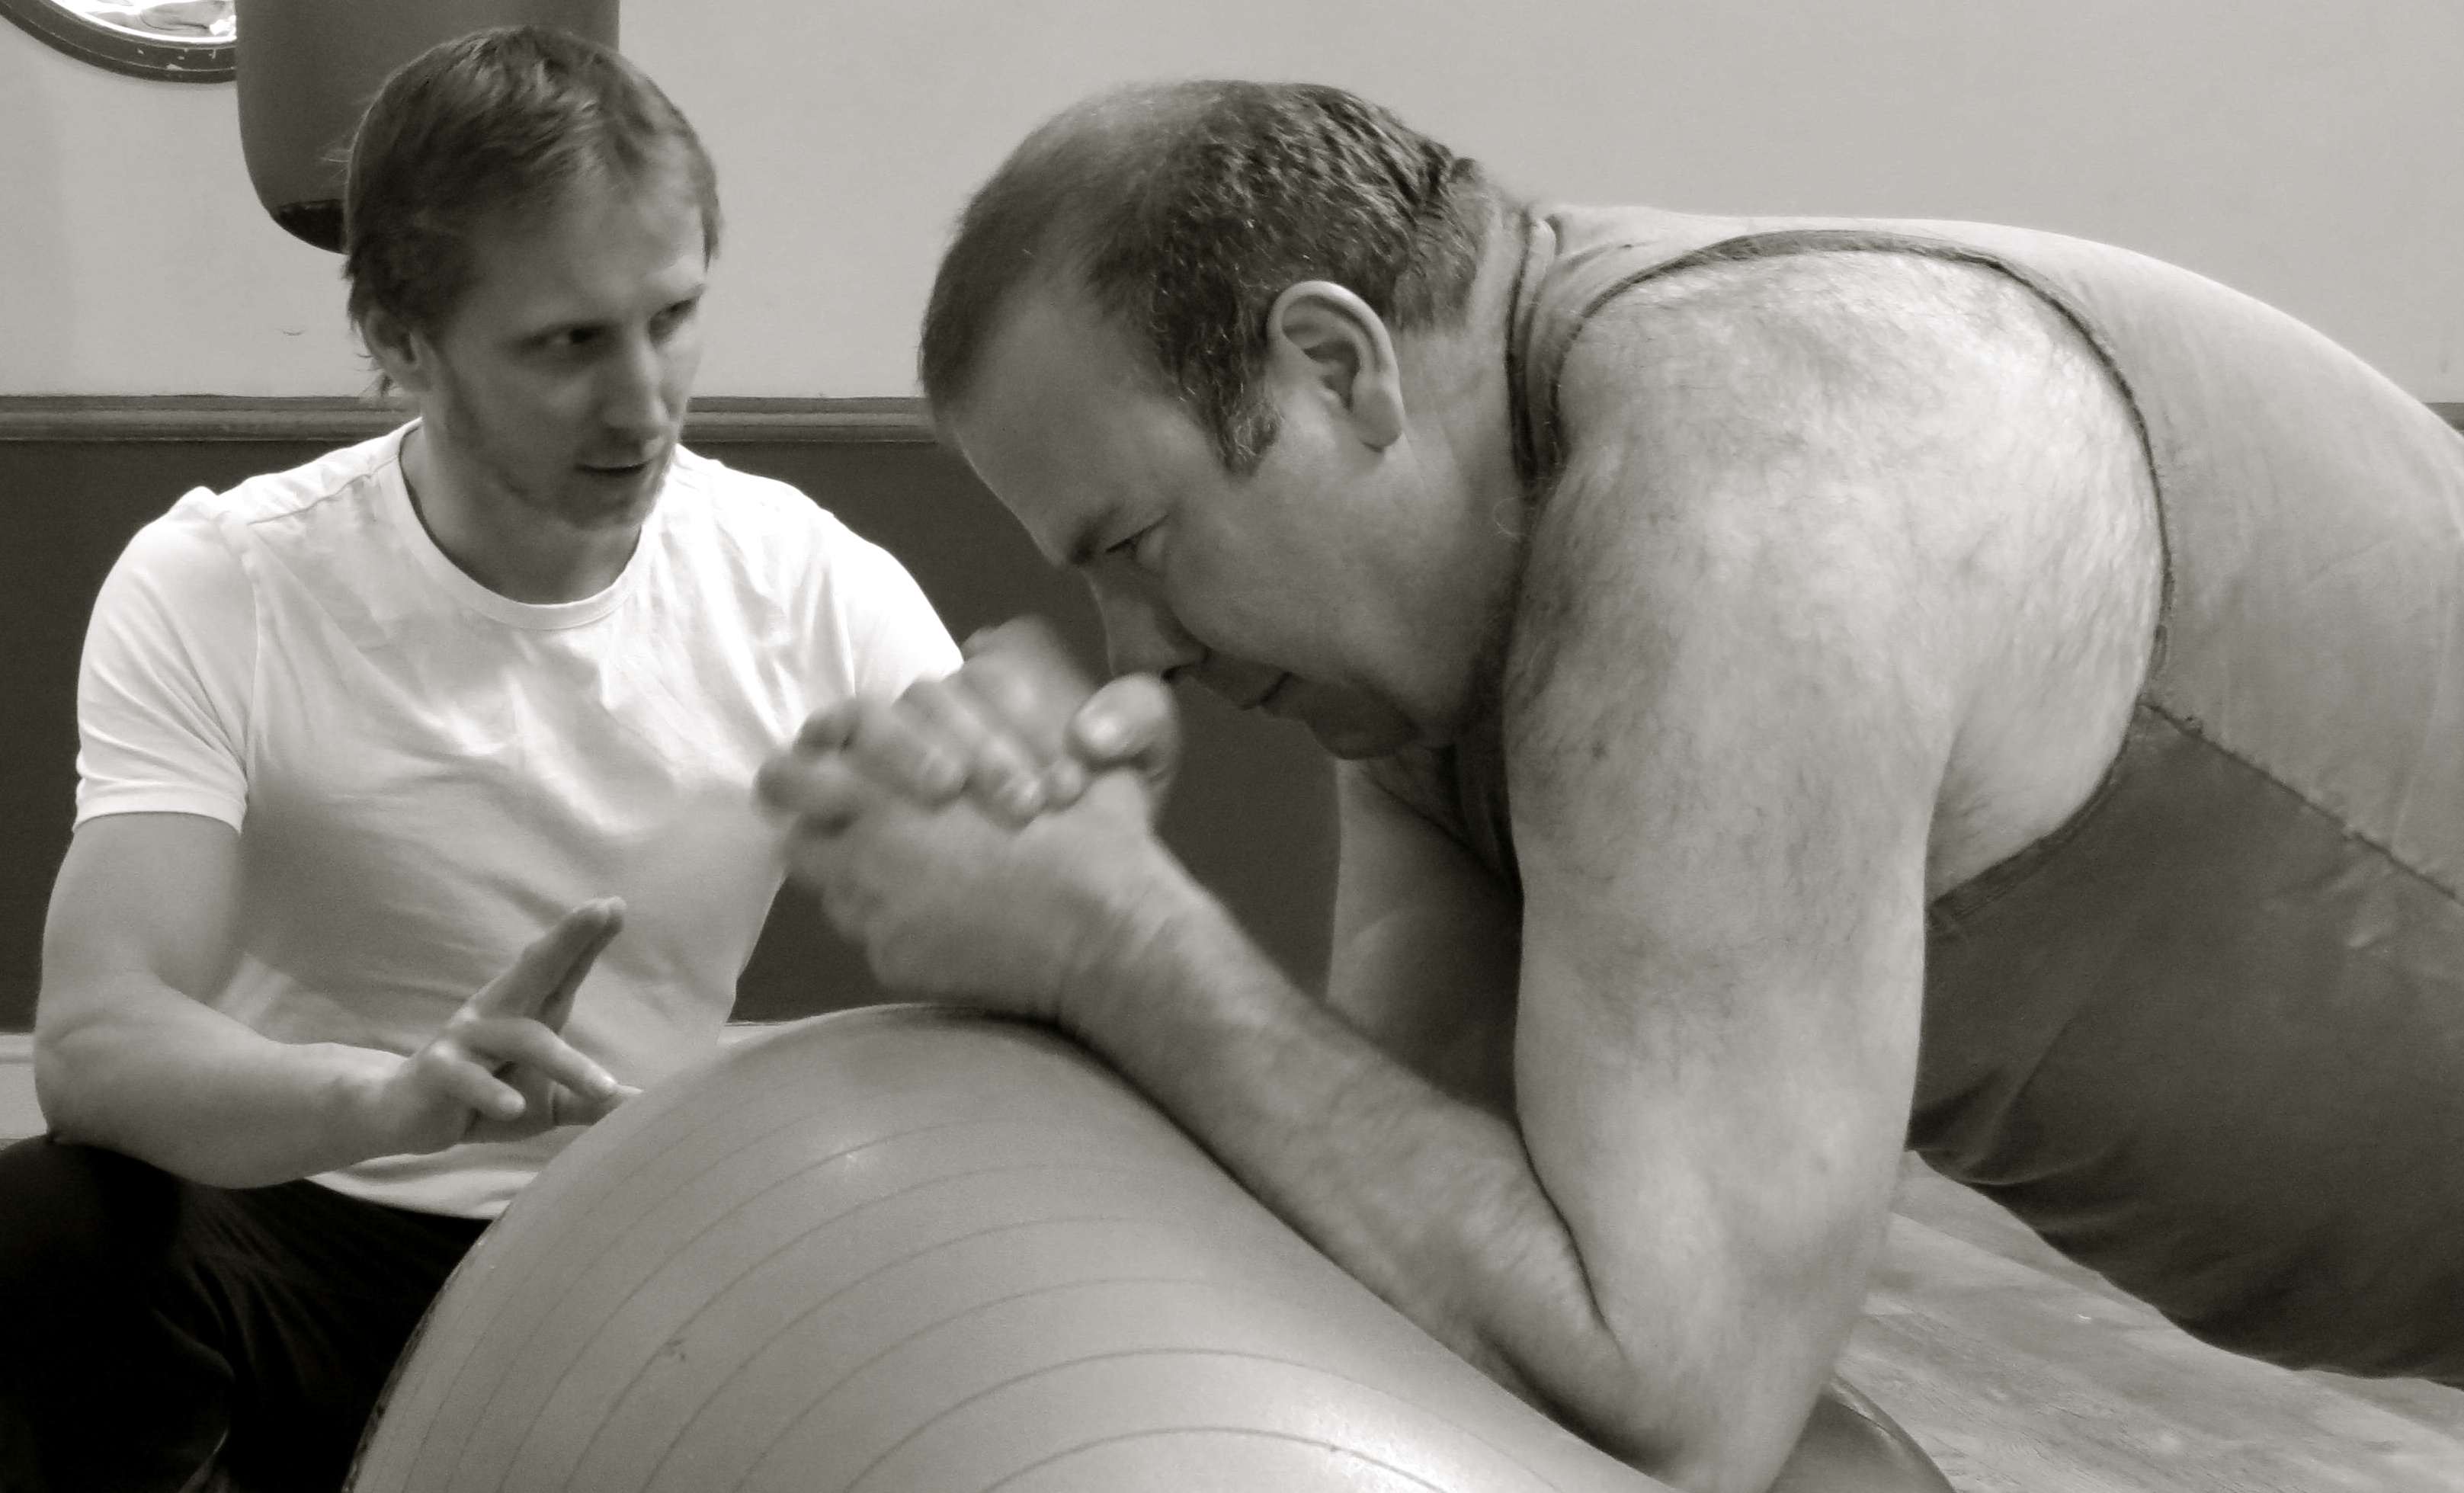 gym ball plank